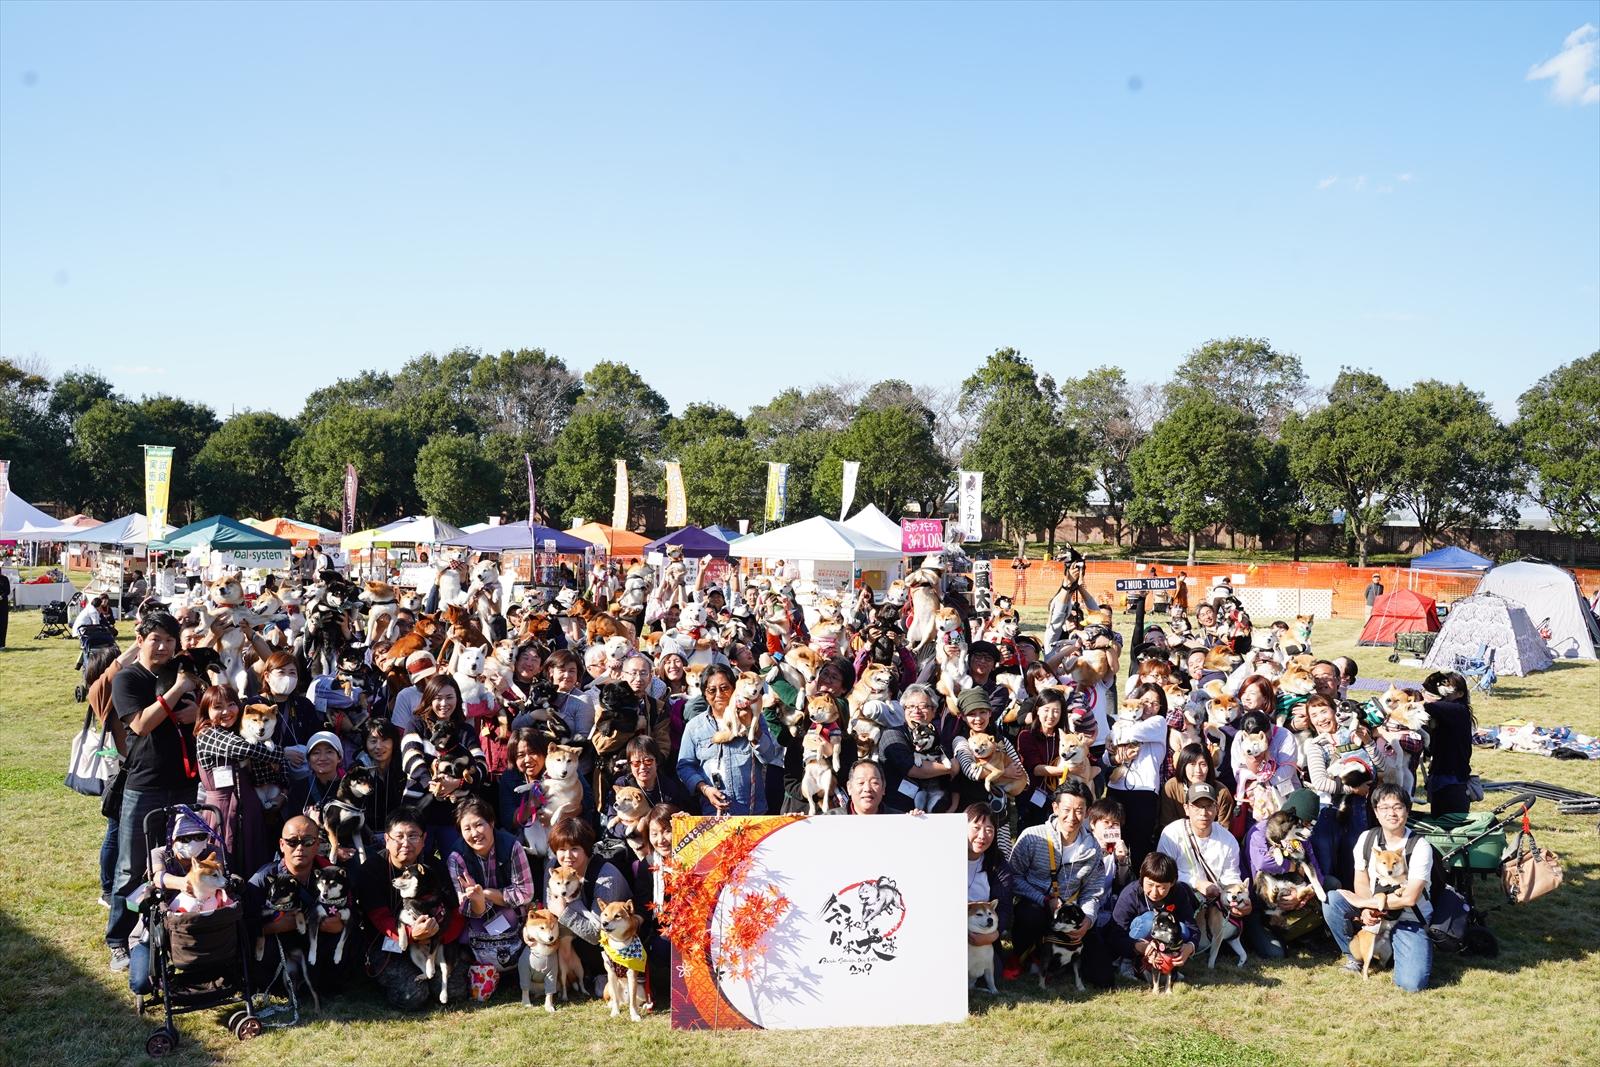 令和日本犬博2020 – REIWA Japanese Dog EXPO –